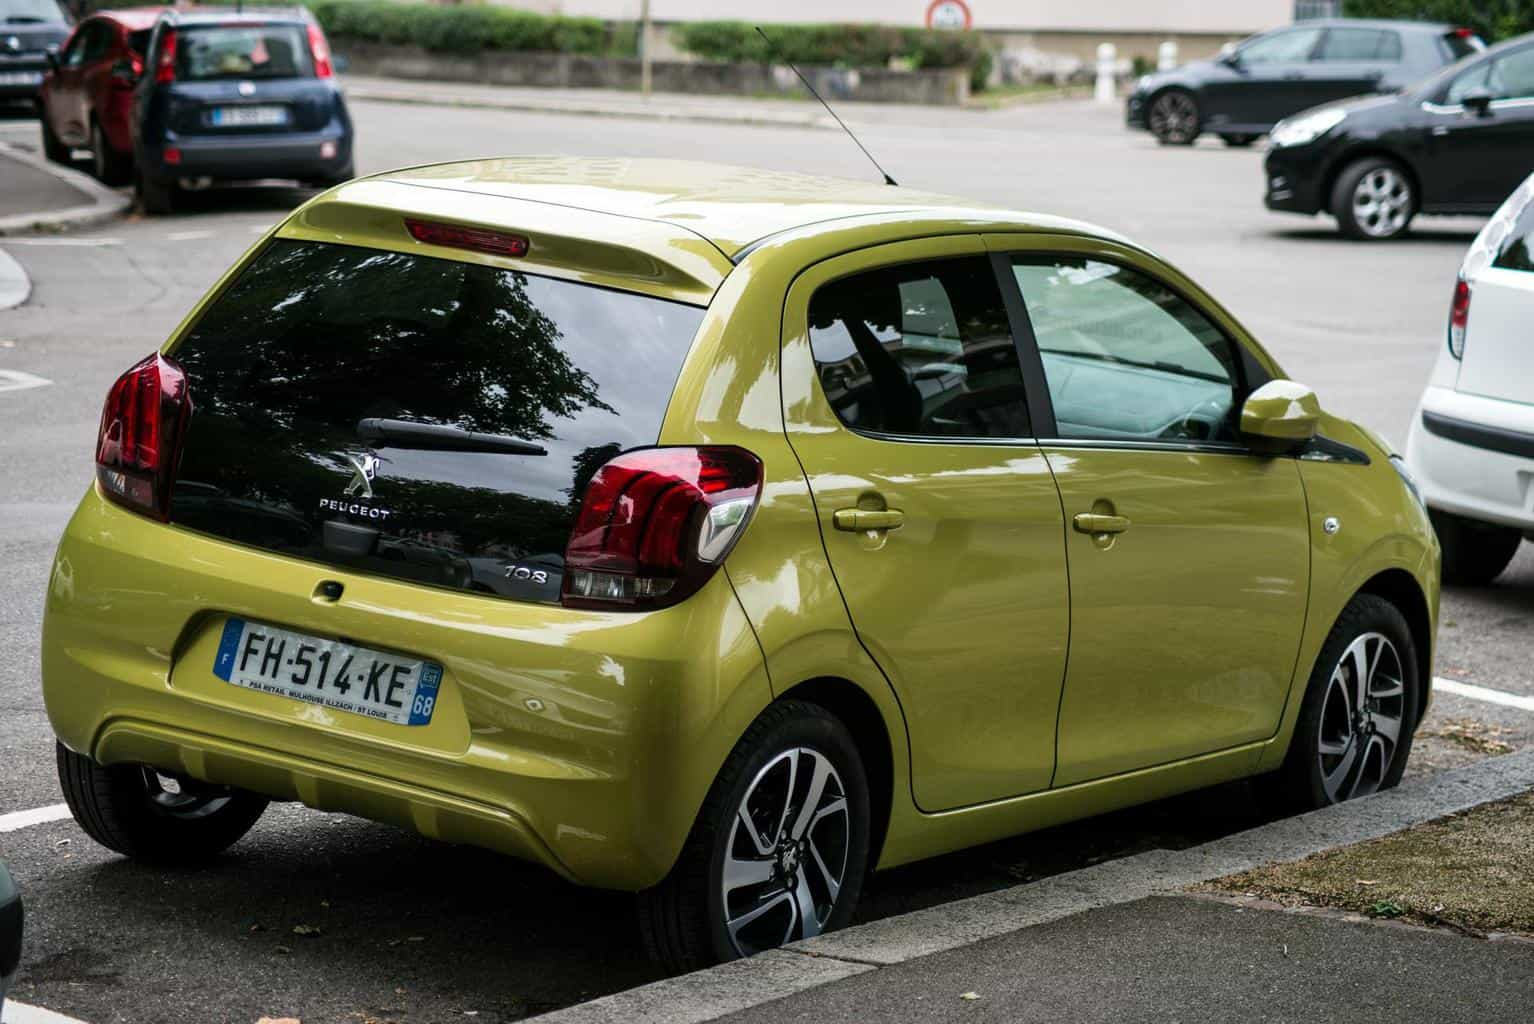 Peugeot soll Mini-Crossover e-1008 als Ersatz für 108 planen